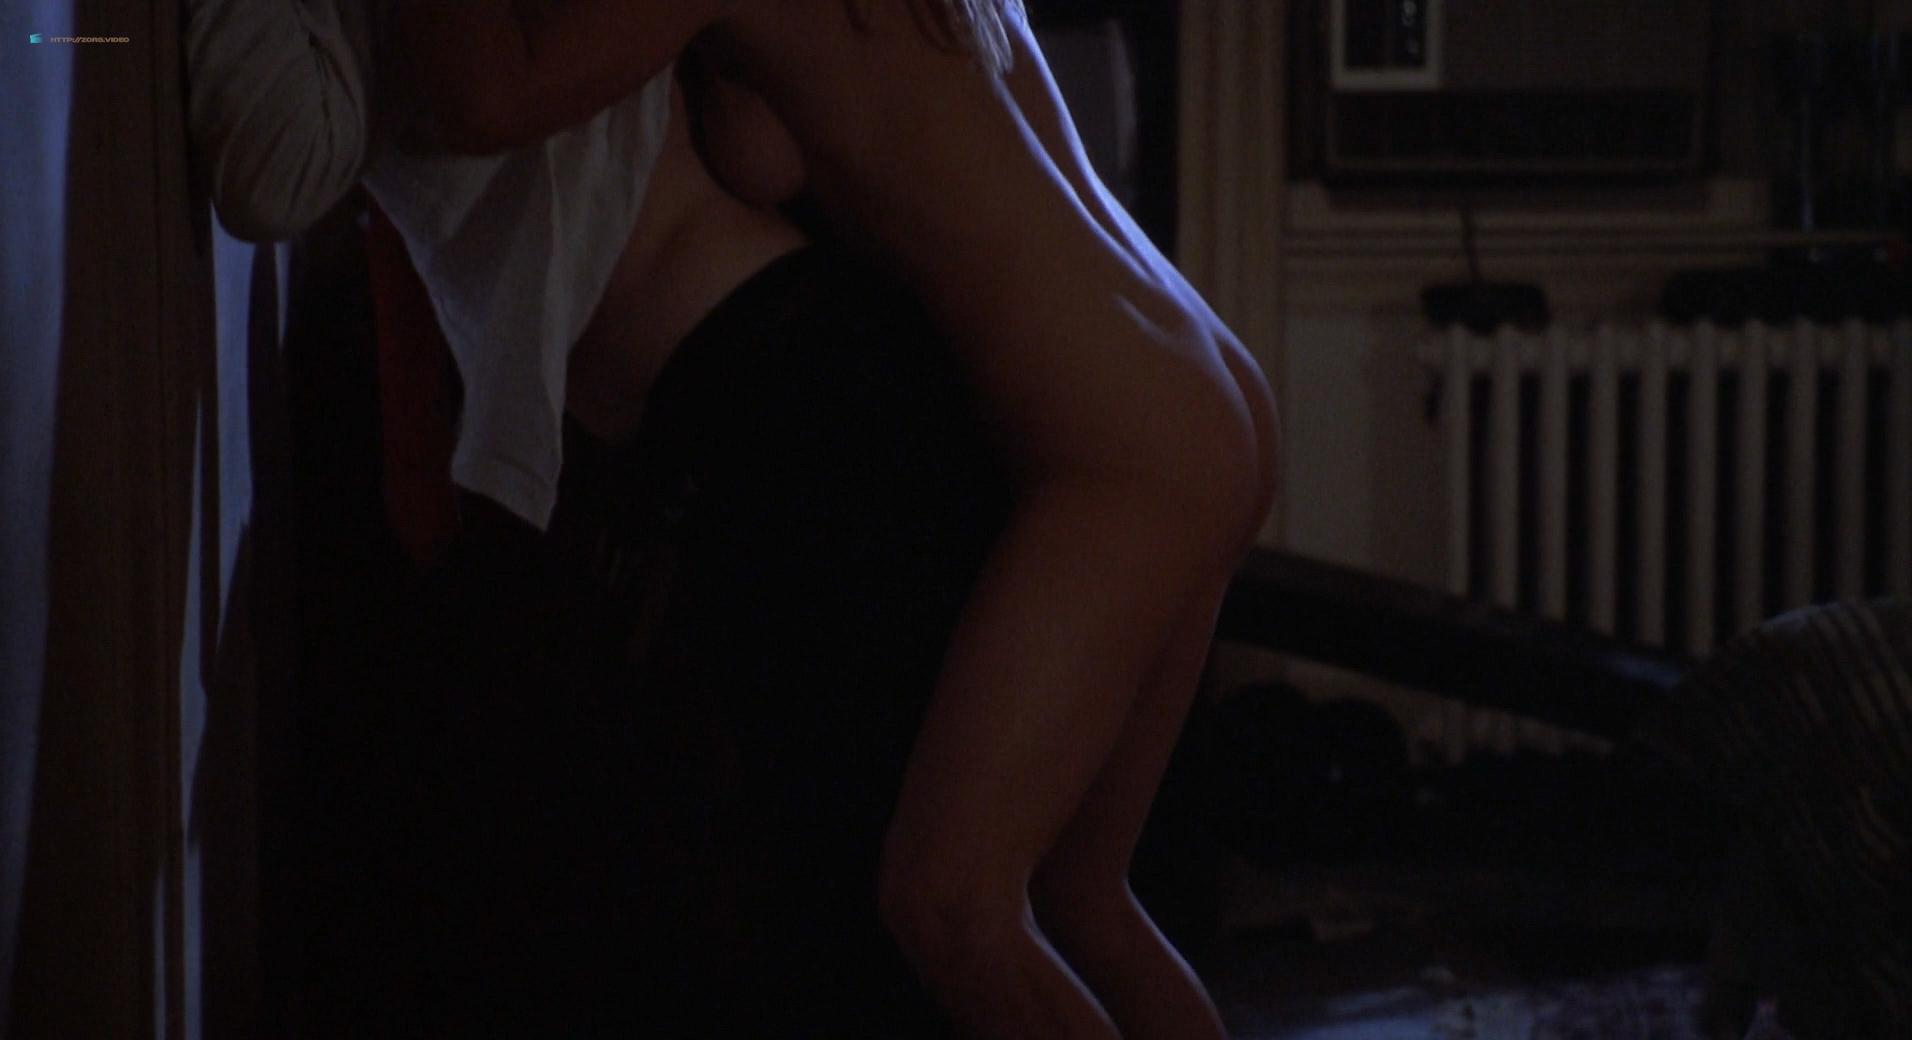 Ellen Barkin nude boobs and butt - Sea of Love (1989) HD 1080p BluRay (2)